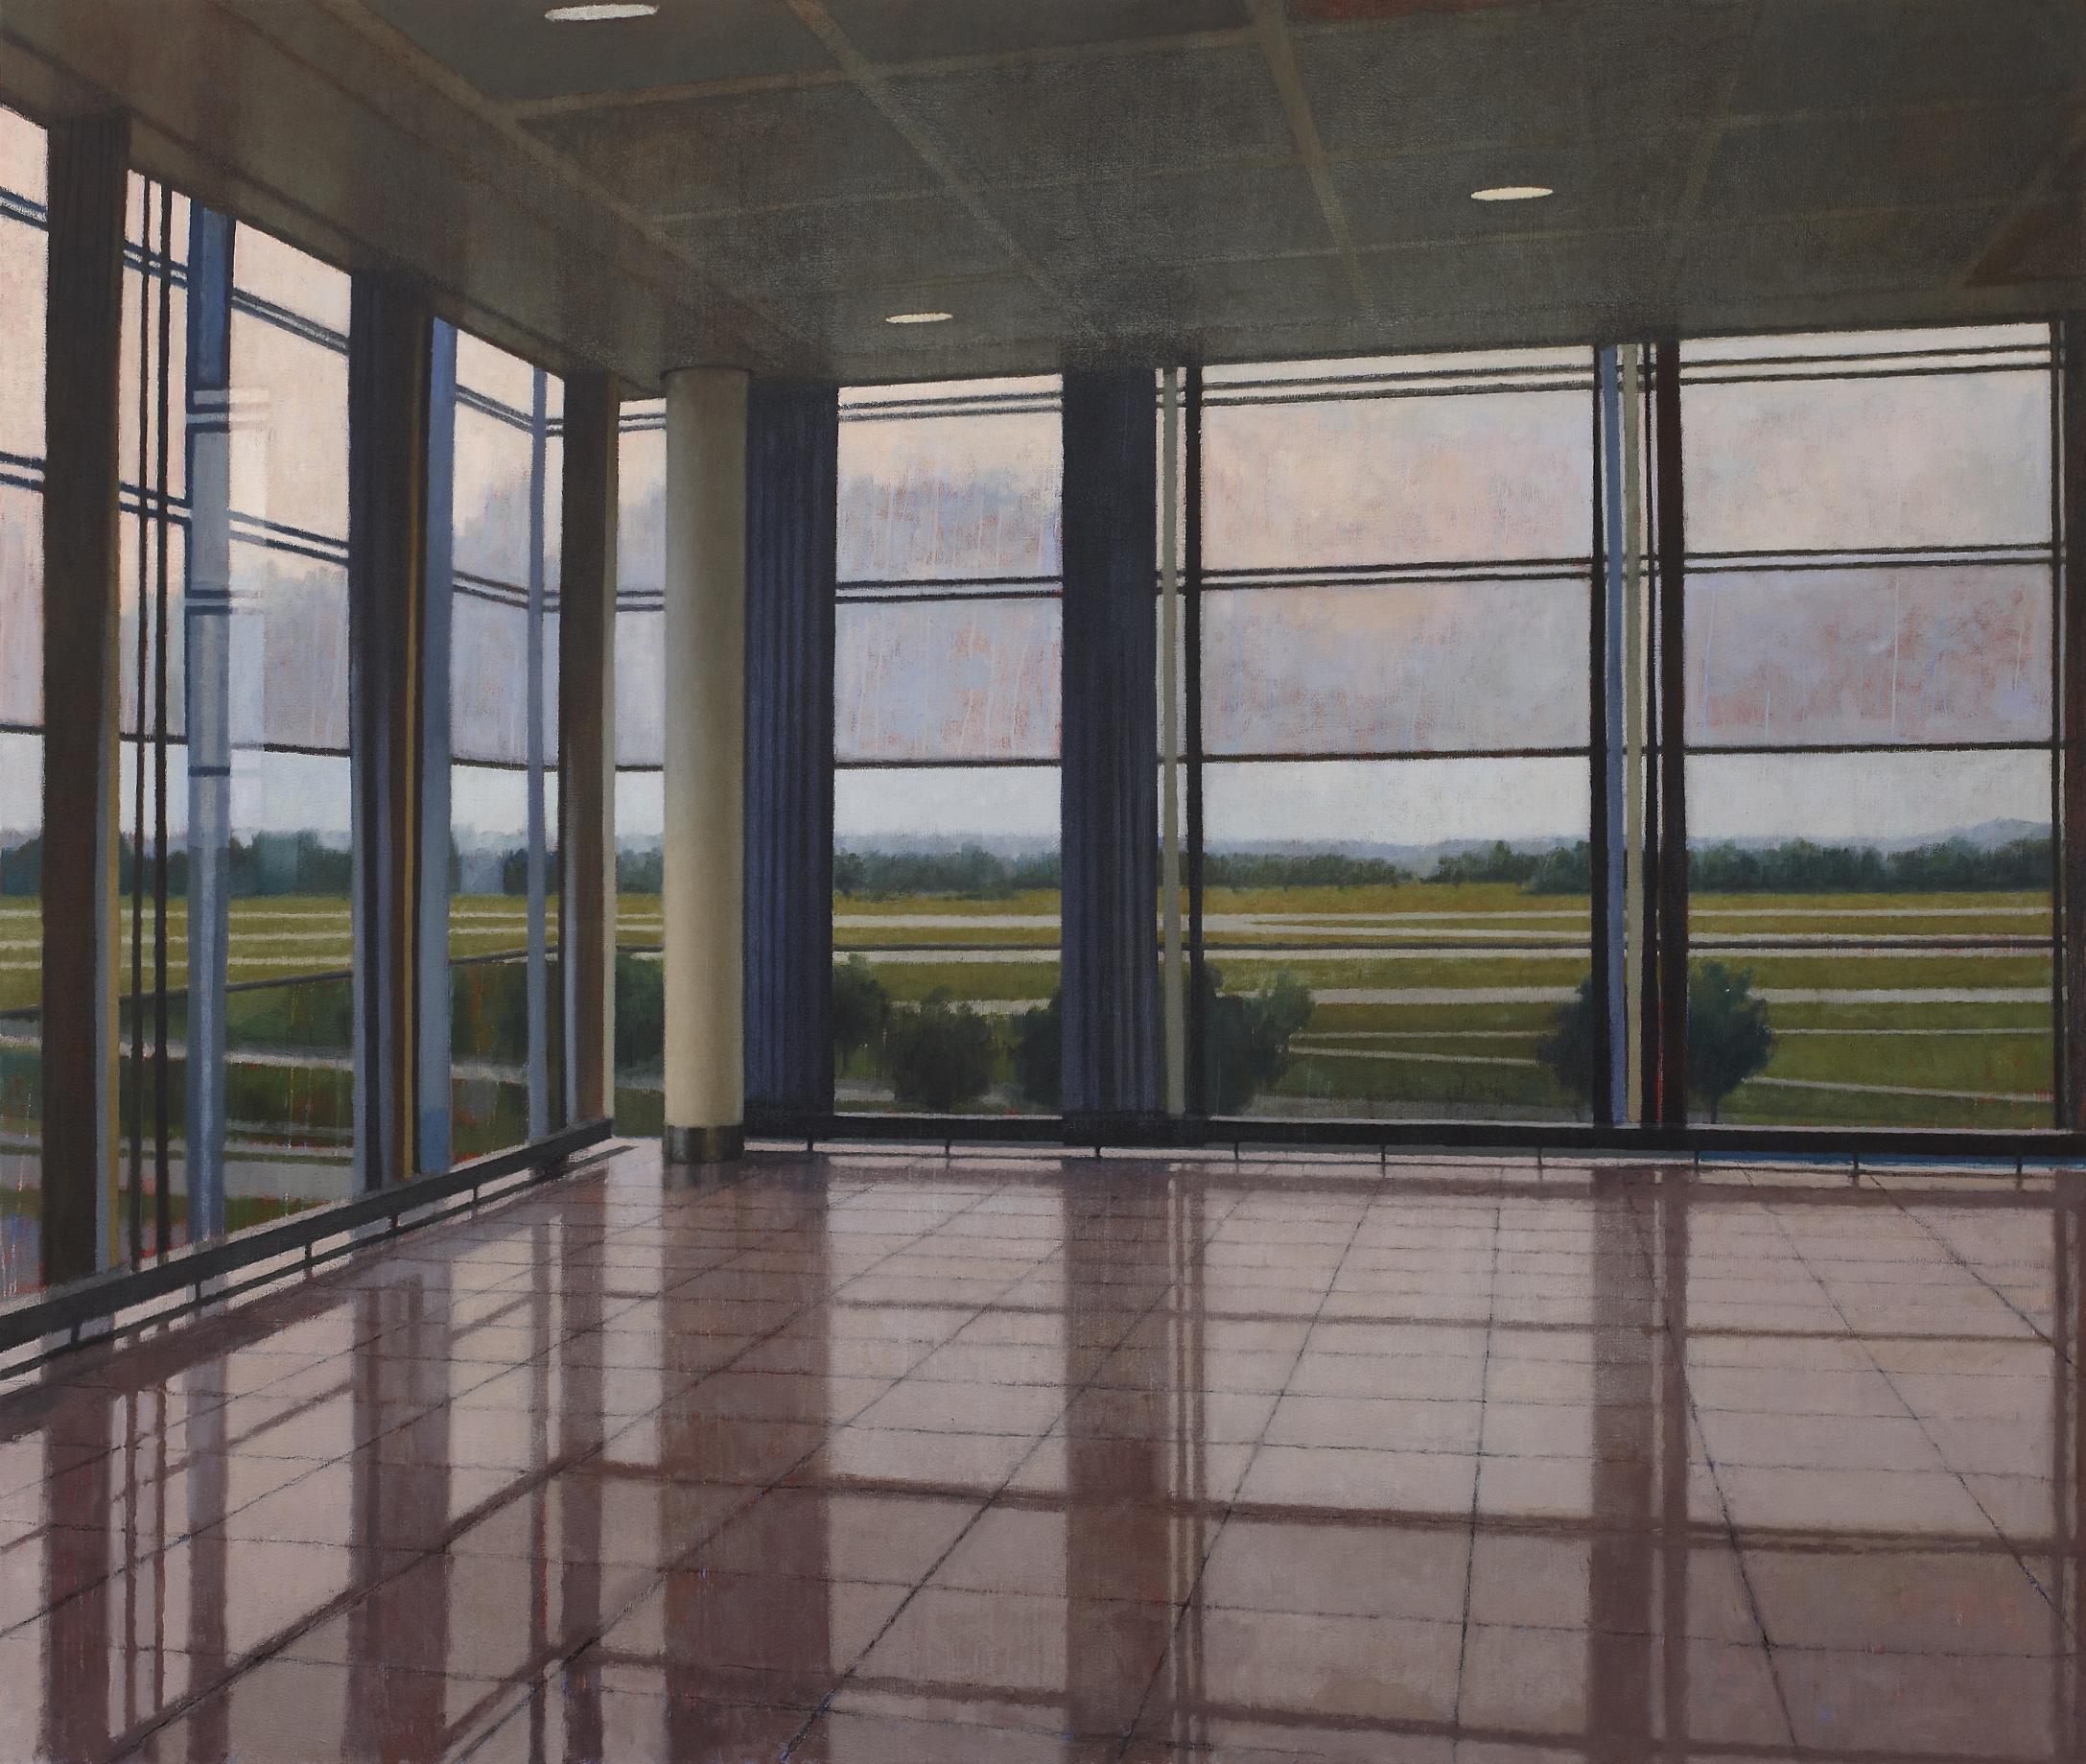 Interior 279 (Munich II), 2011, oil on linen, 1980mm x 2300mm